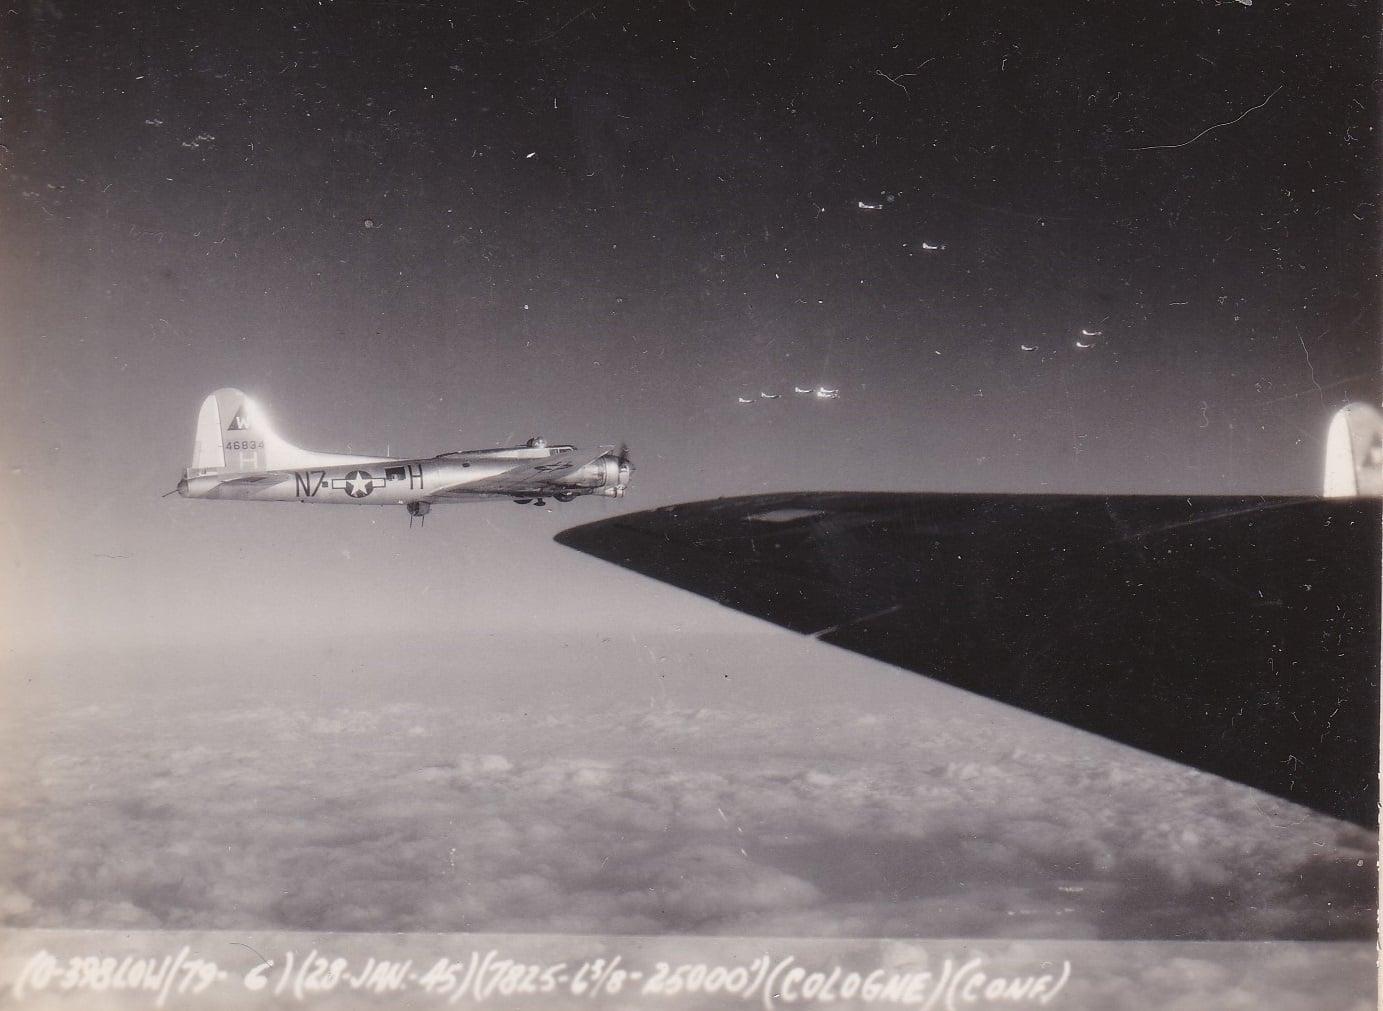 B-17 #44-6834